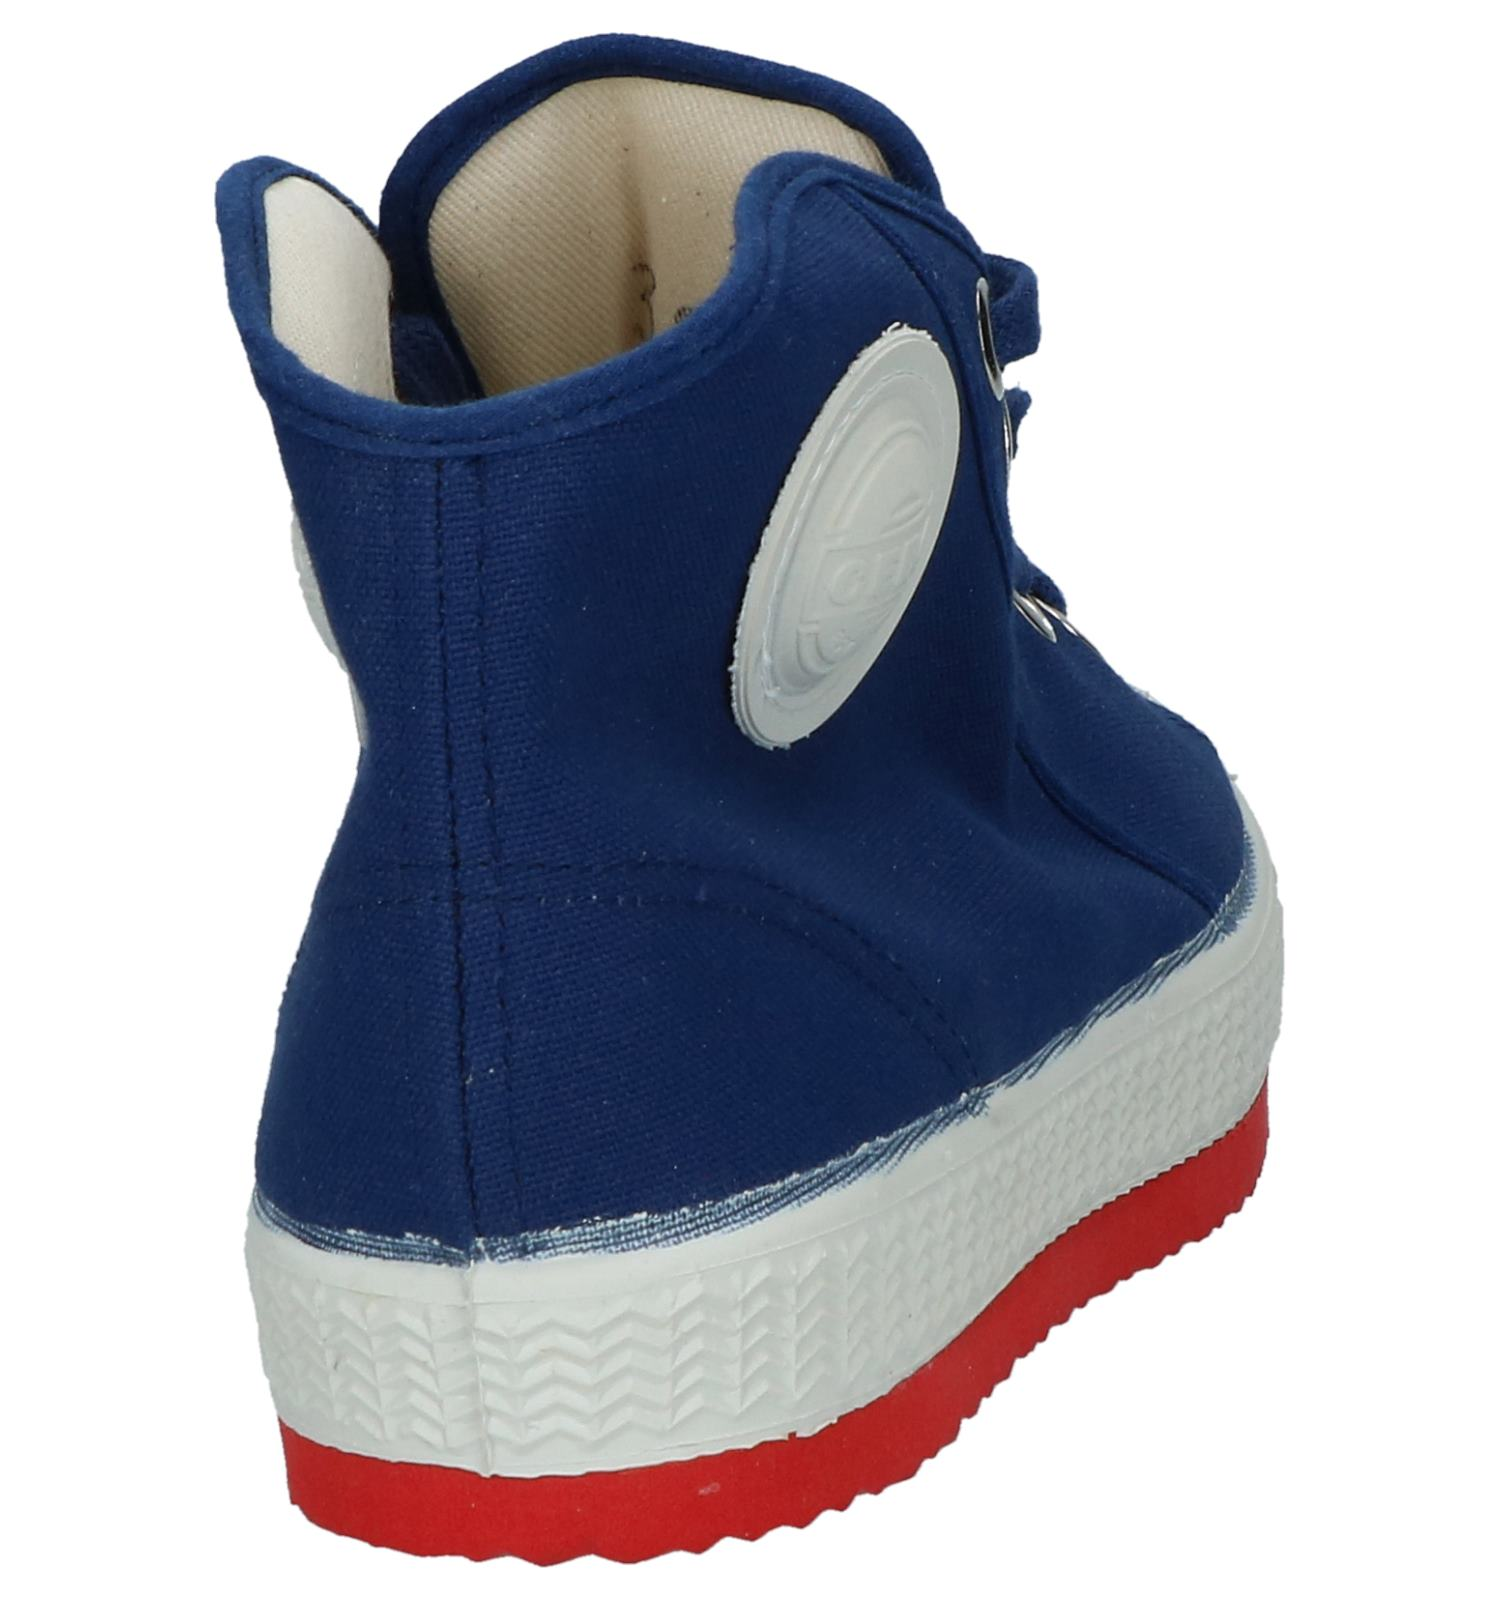 c9d5390beae Blauwe Hoge Sportieve Sneakers 0051   TORFS.BE   Gratis verzend en retour